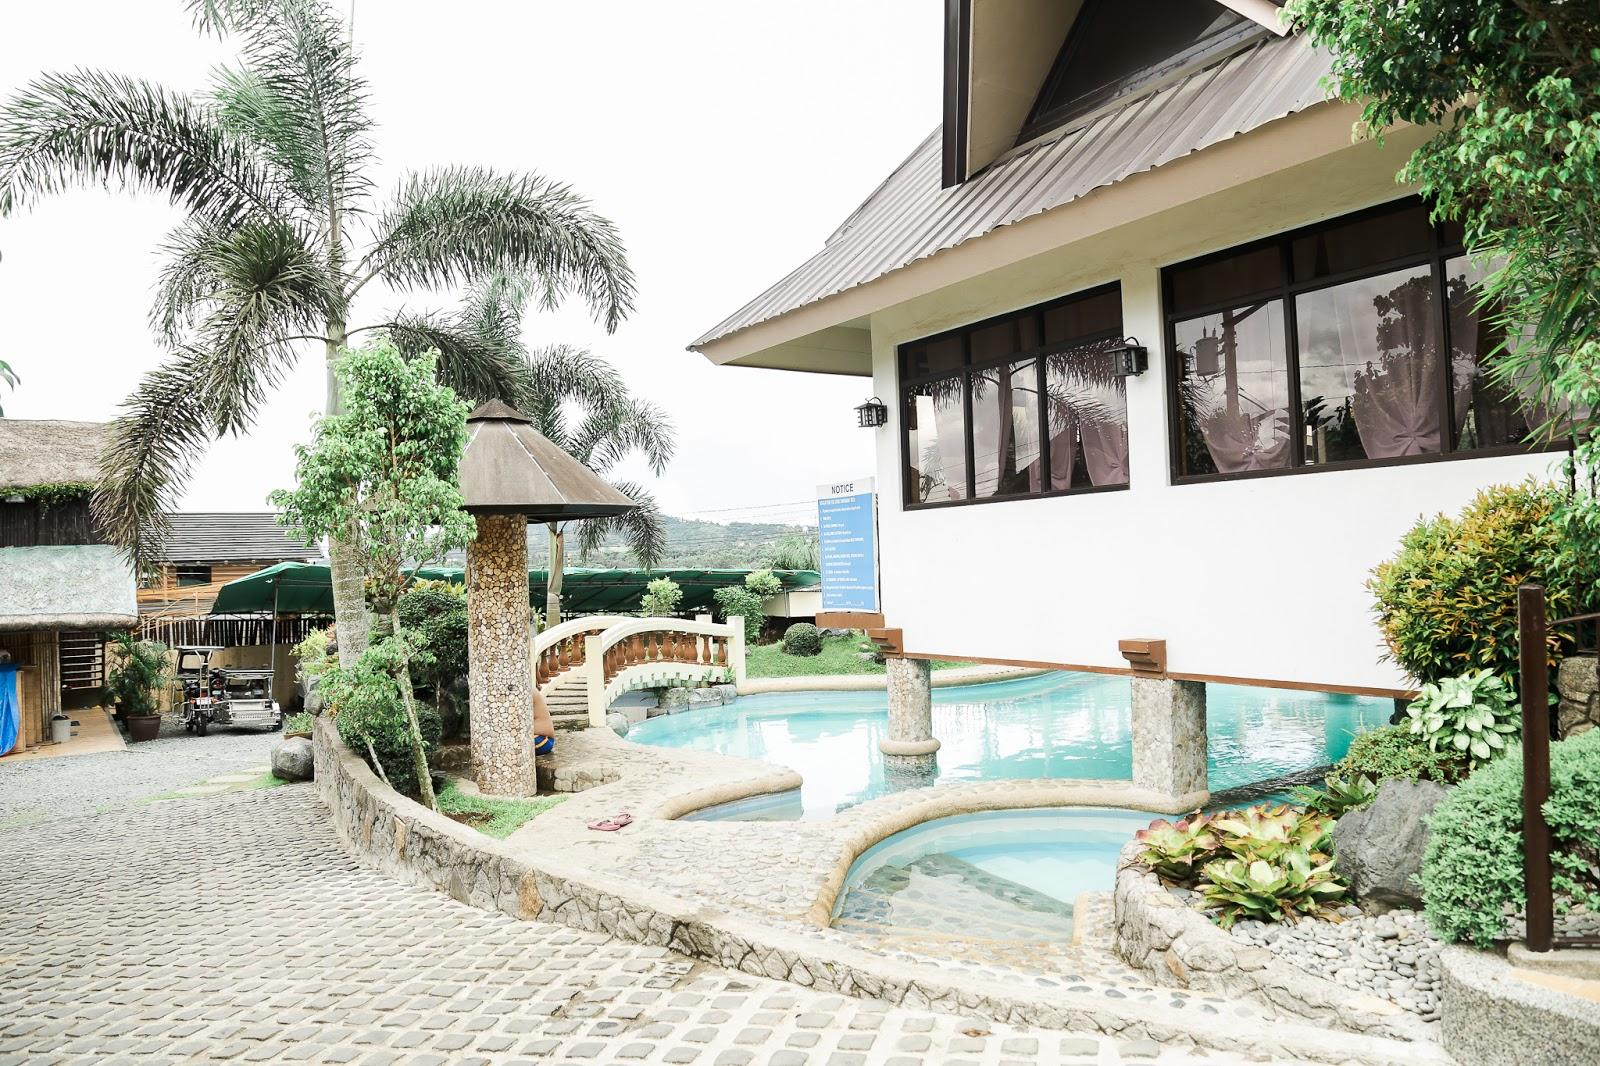 Piña Colina Resort, Tagaytay - The Foodinista